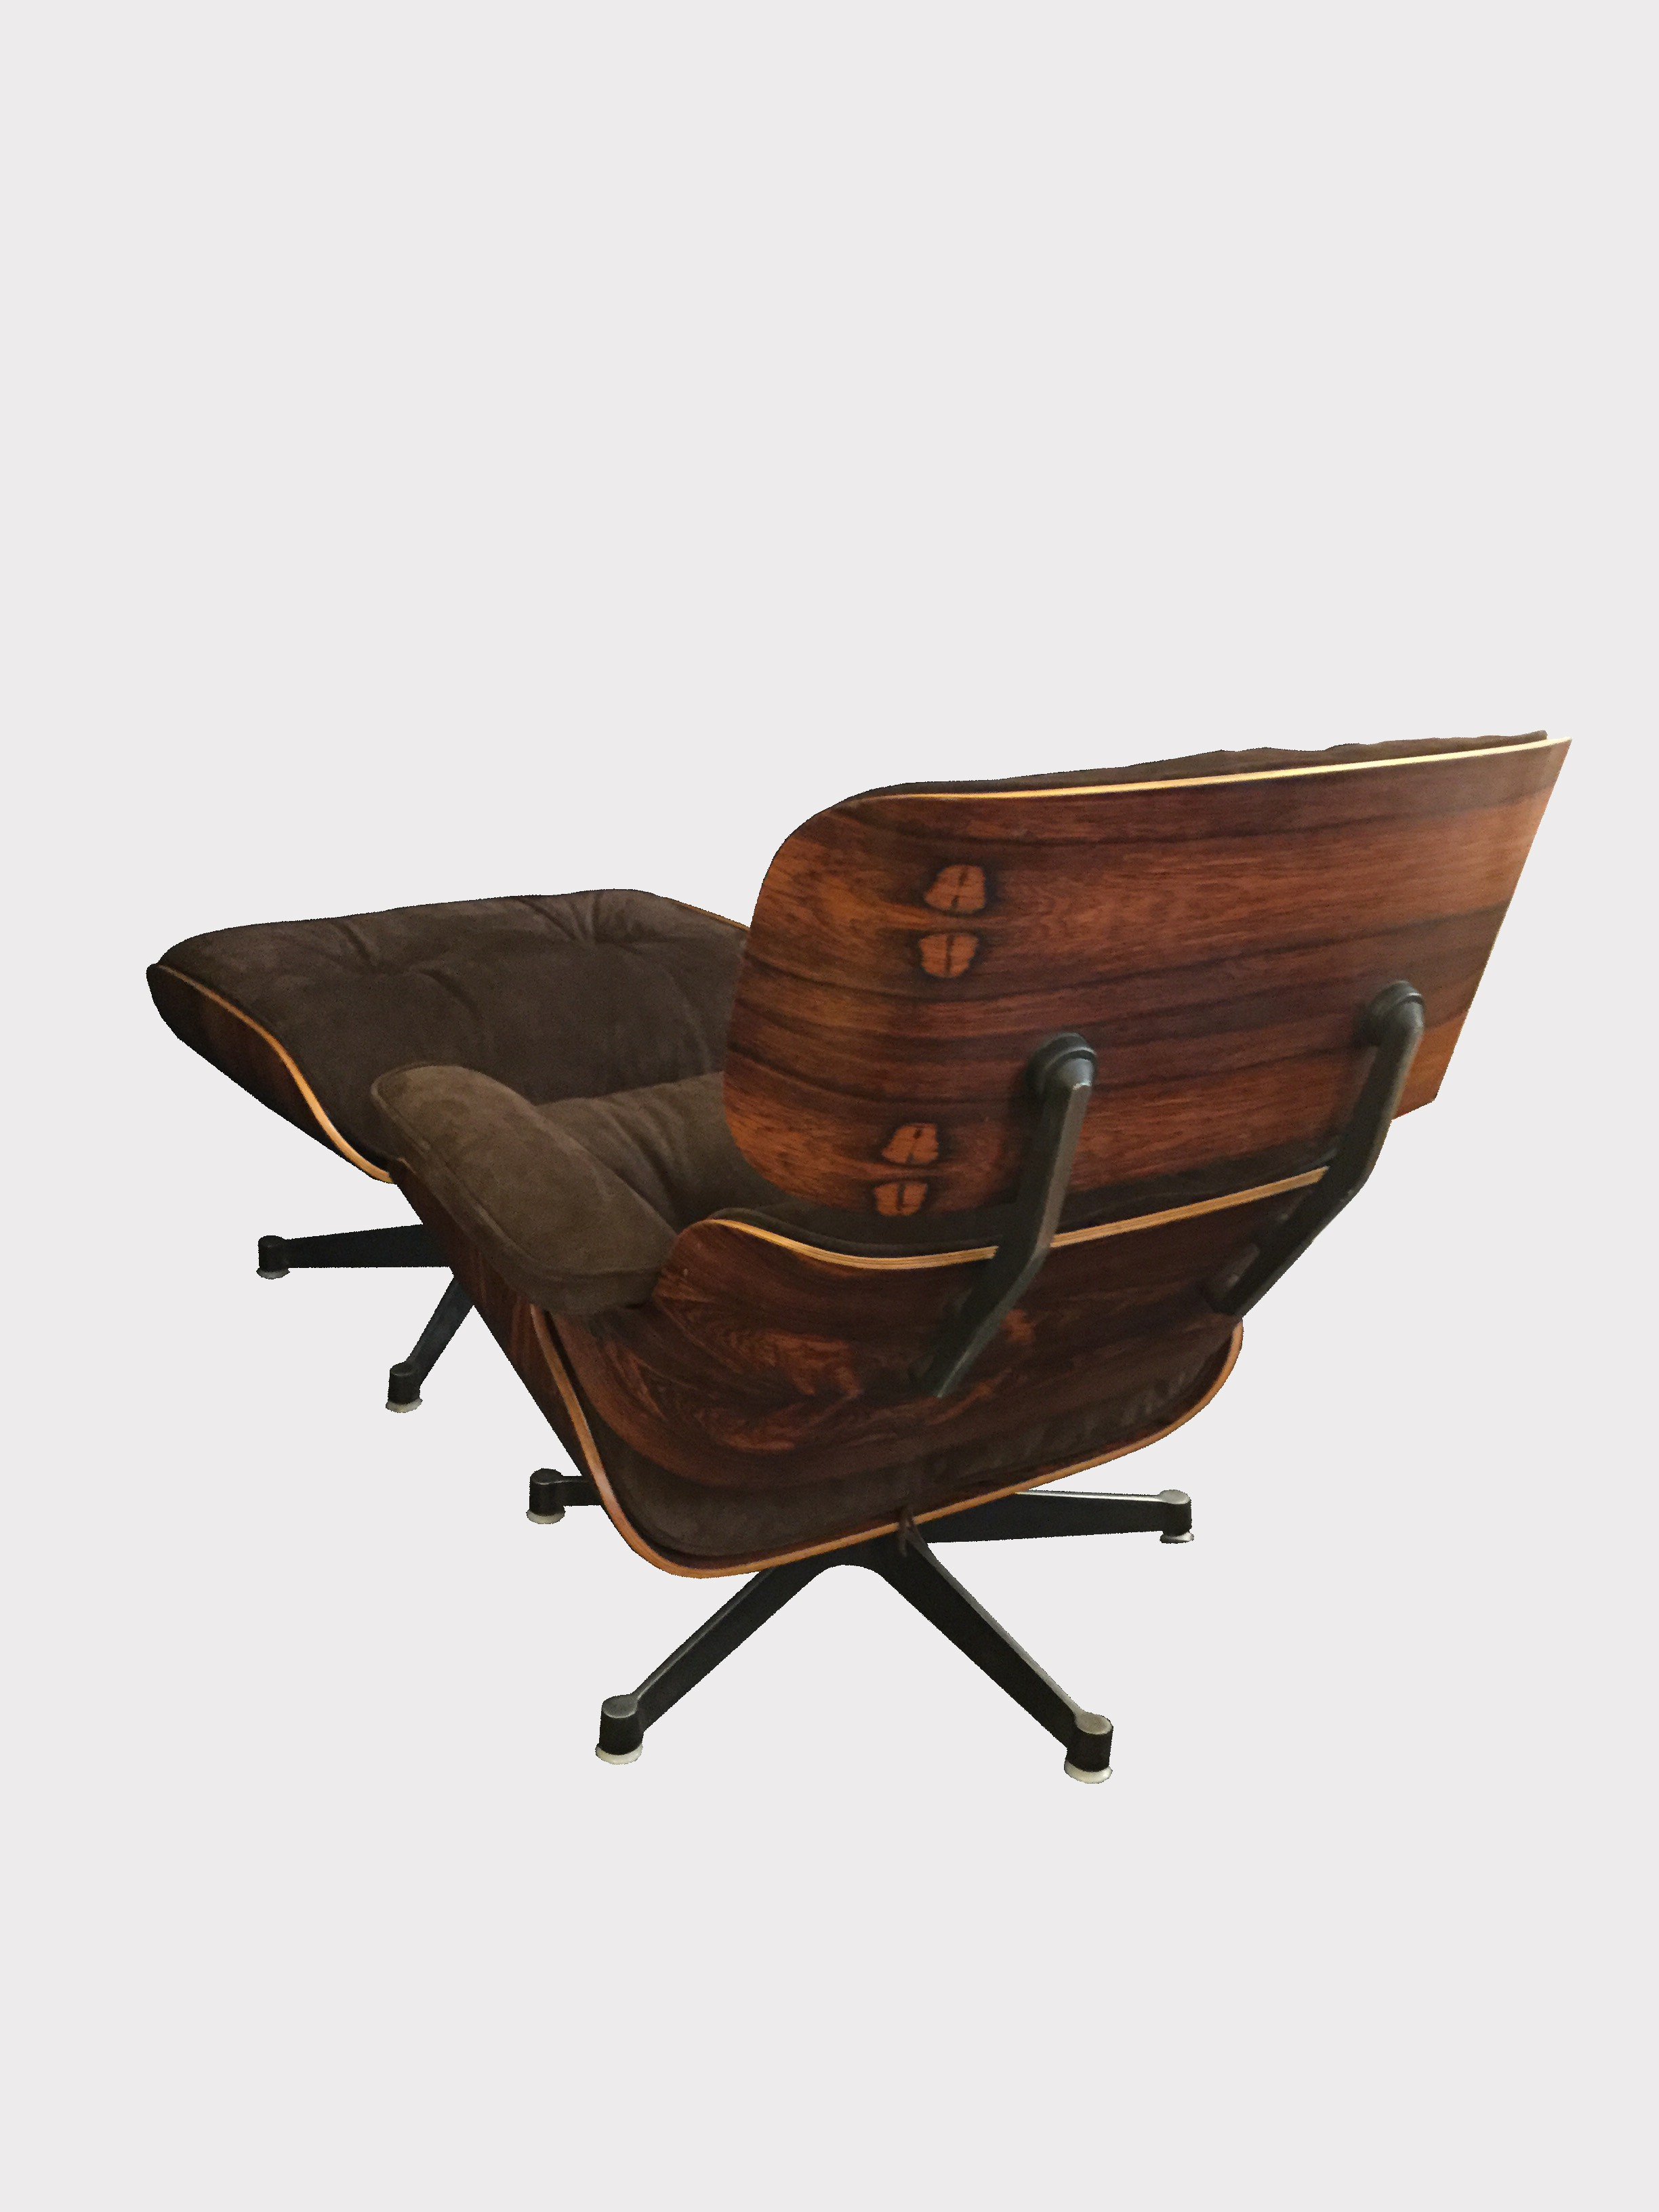 Lounge Chair And Ottoman Herman Miller In Buckskin